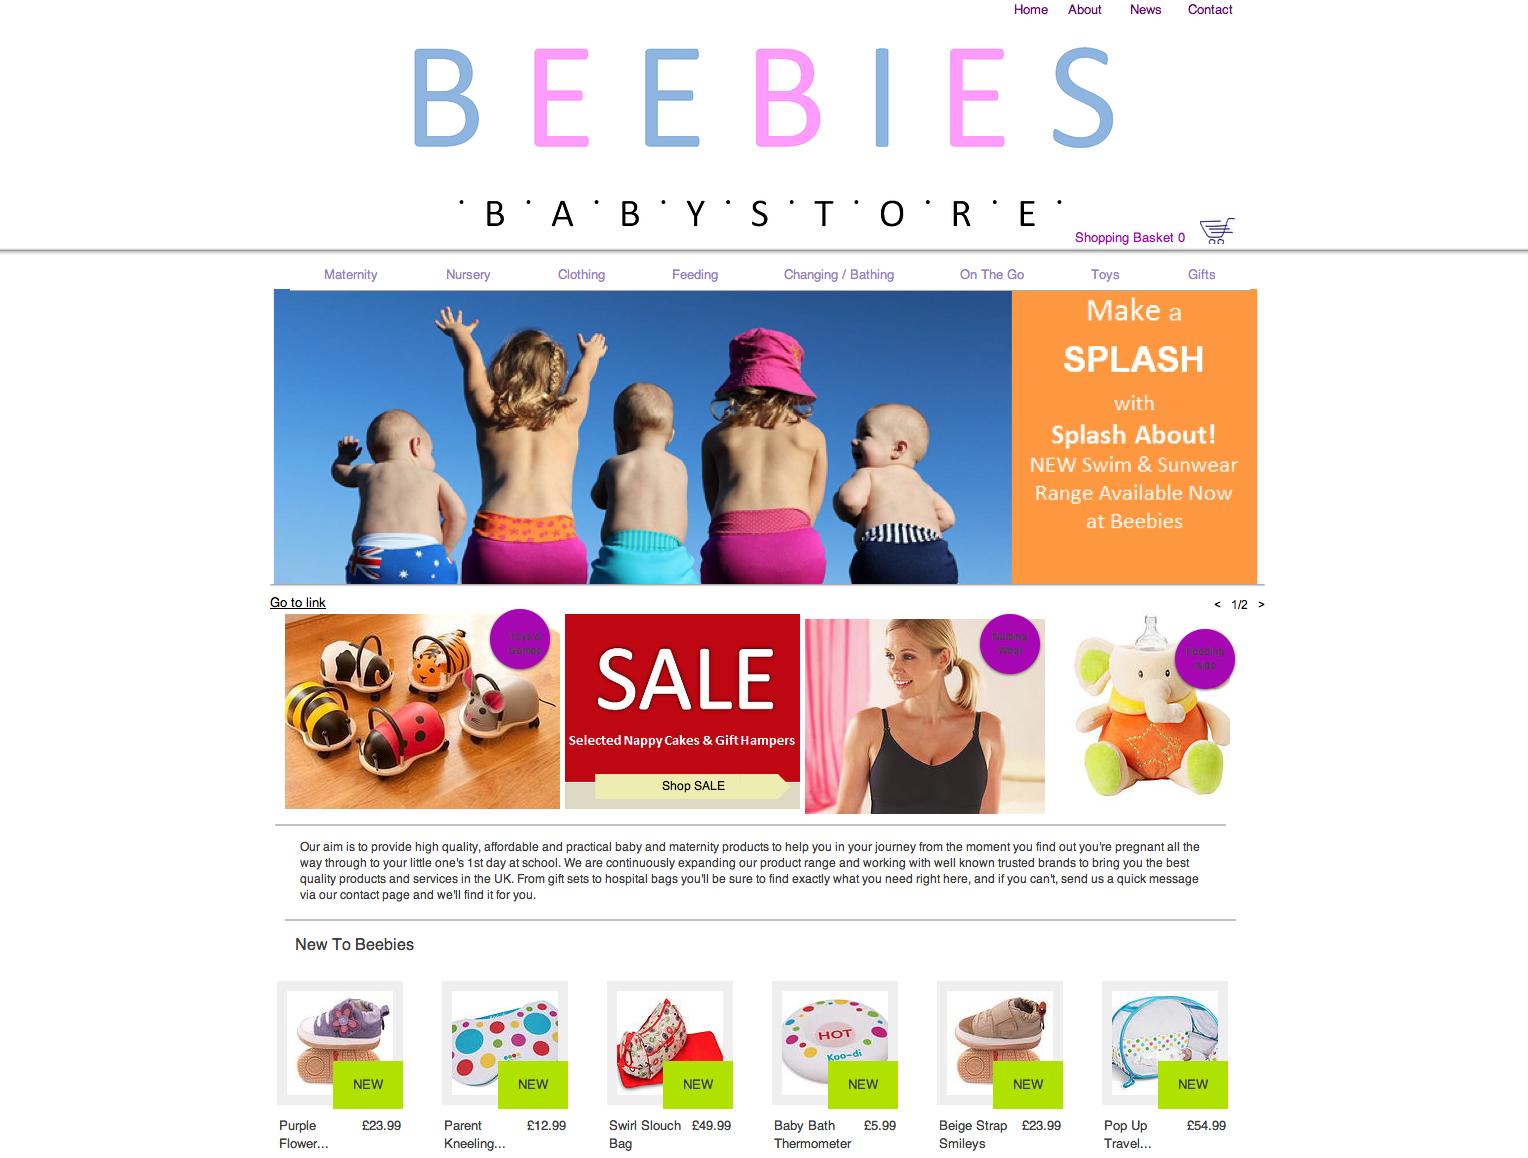 Beebies Baby Store